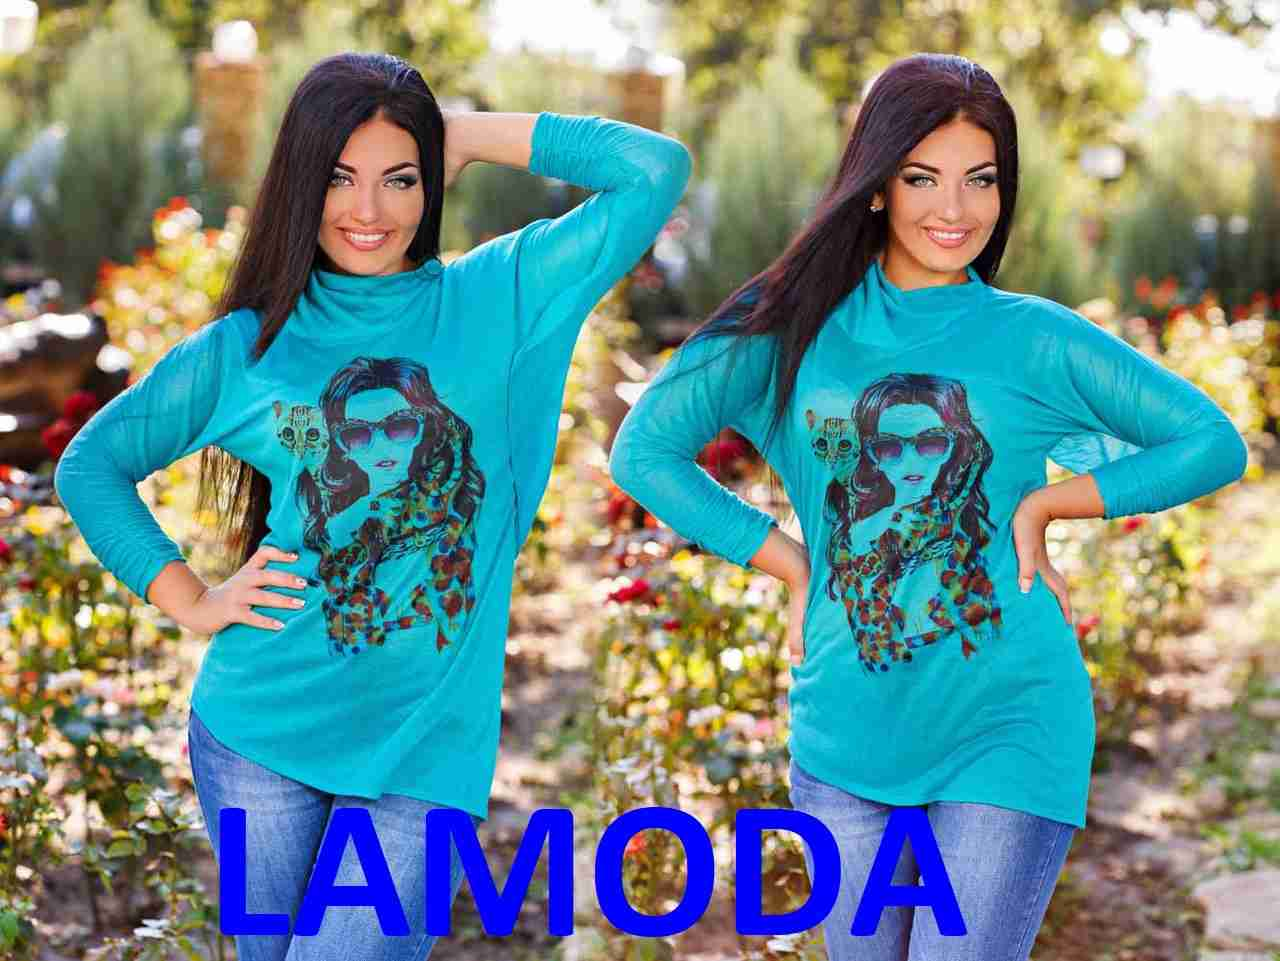 a23e4400e1f9 Купить женские туники с ламода и вайлдберриз или найти на ...